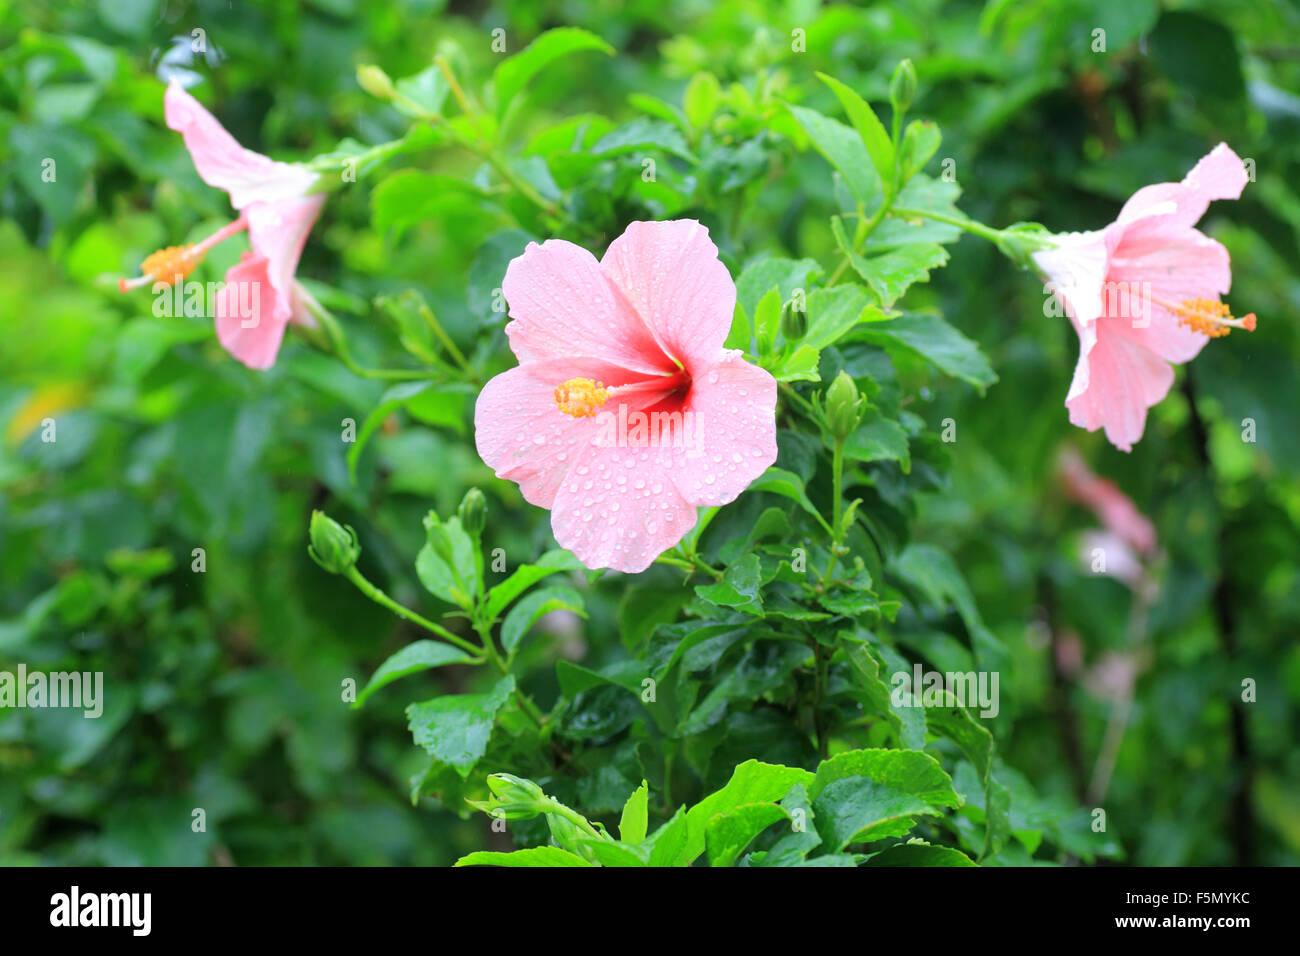 Hibiscus flower in Okinawa, Japan - Stock Image